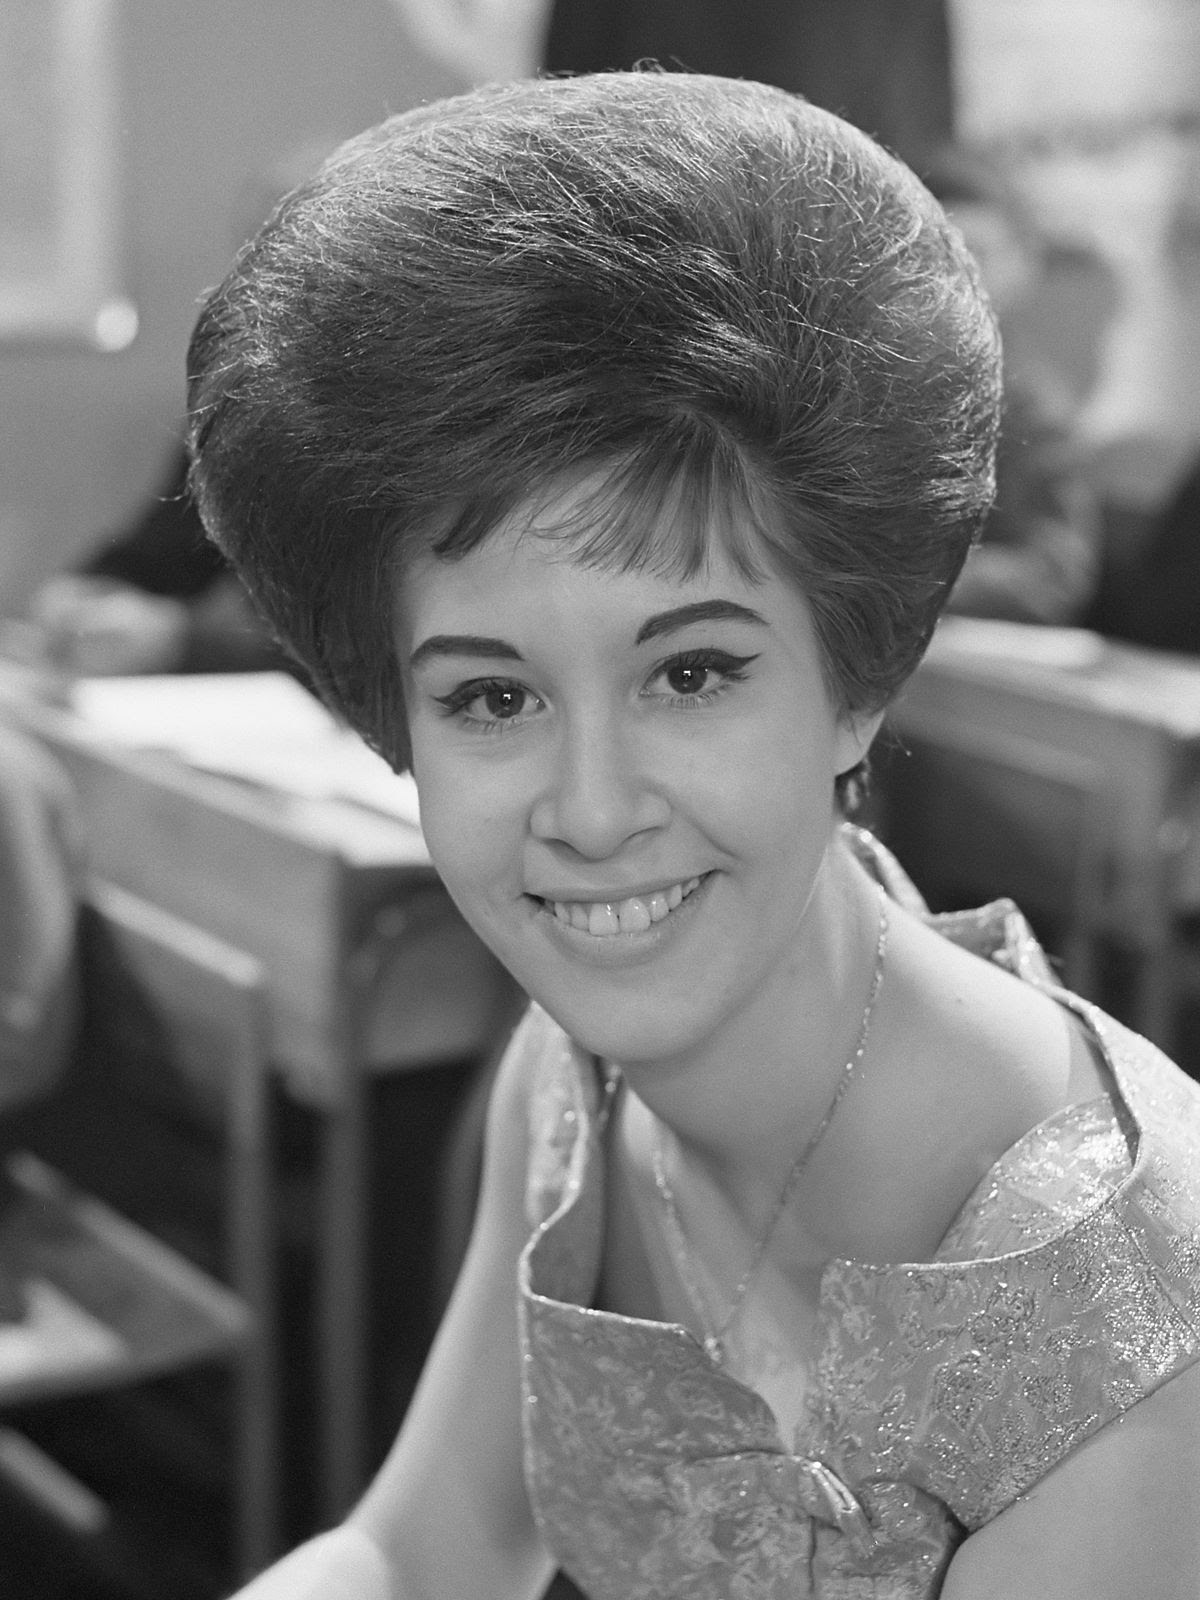 """Helen Shapiro (1963)"" by Harry Pot / Anefo - Nationaal Archief. Licensed under CC BY-SA 3.0 via Wikimedia Commons."